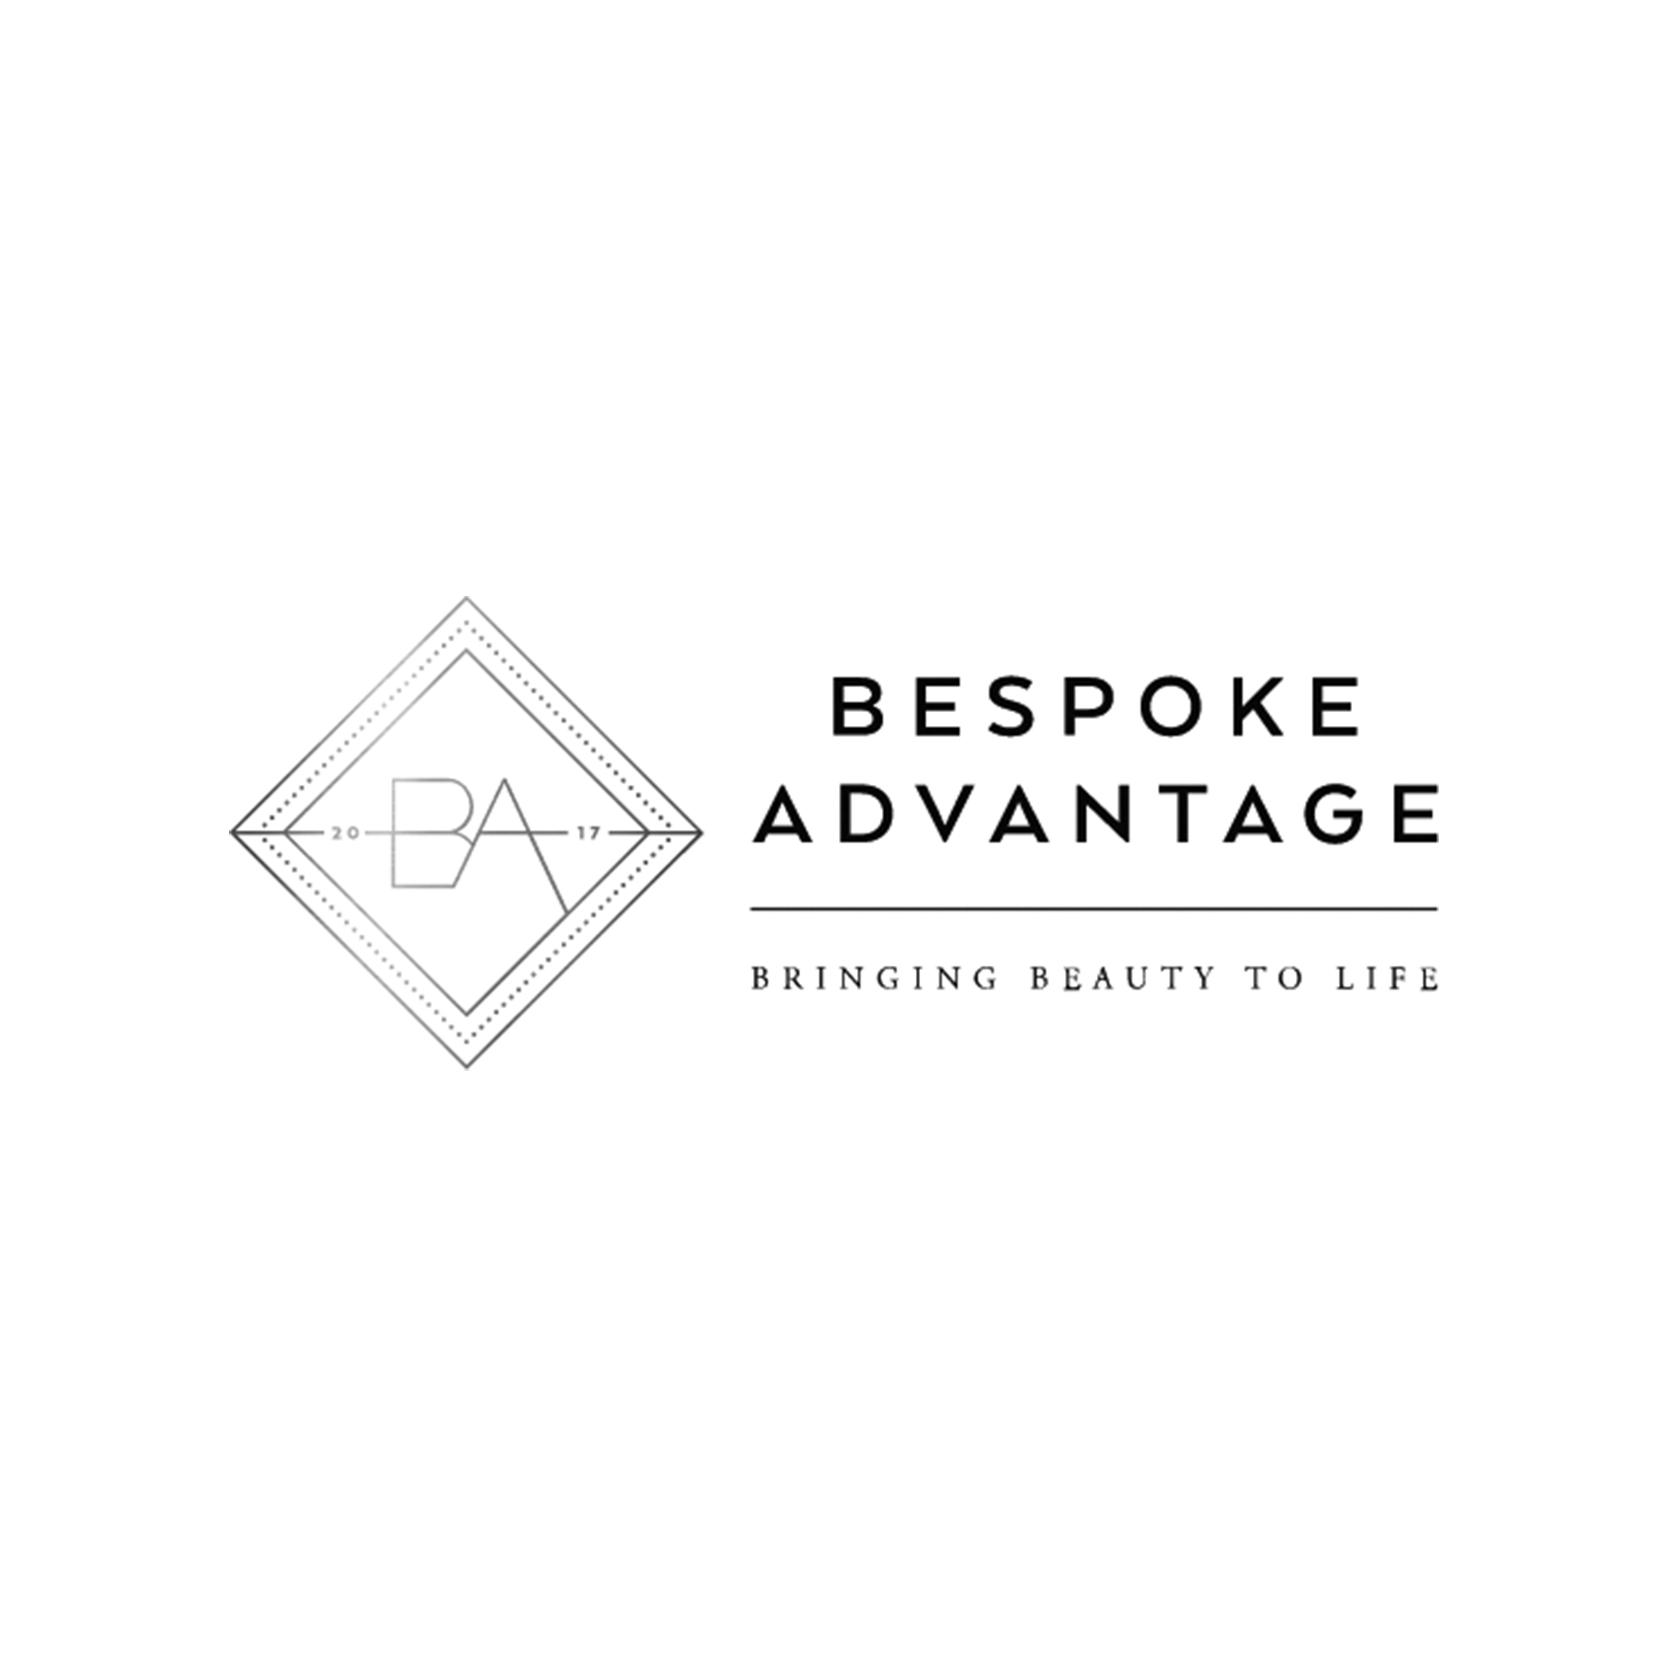 Bespoke_Advantage.jpg